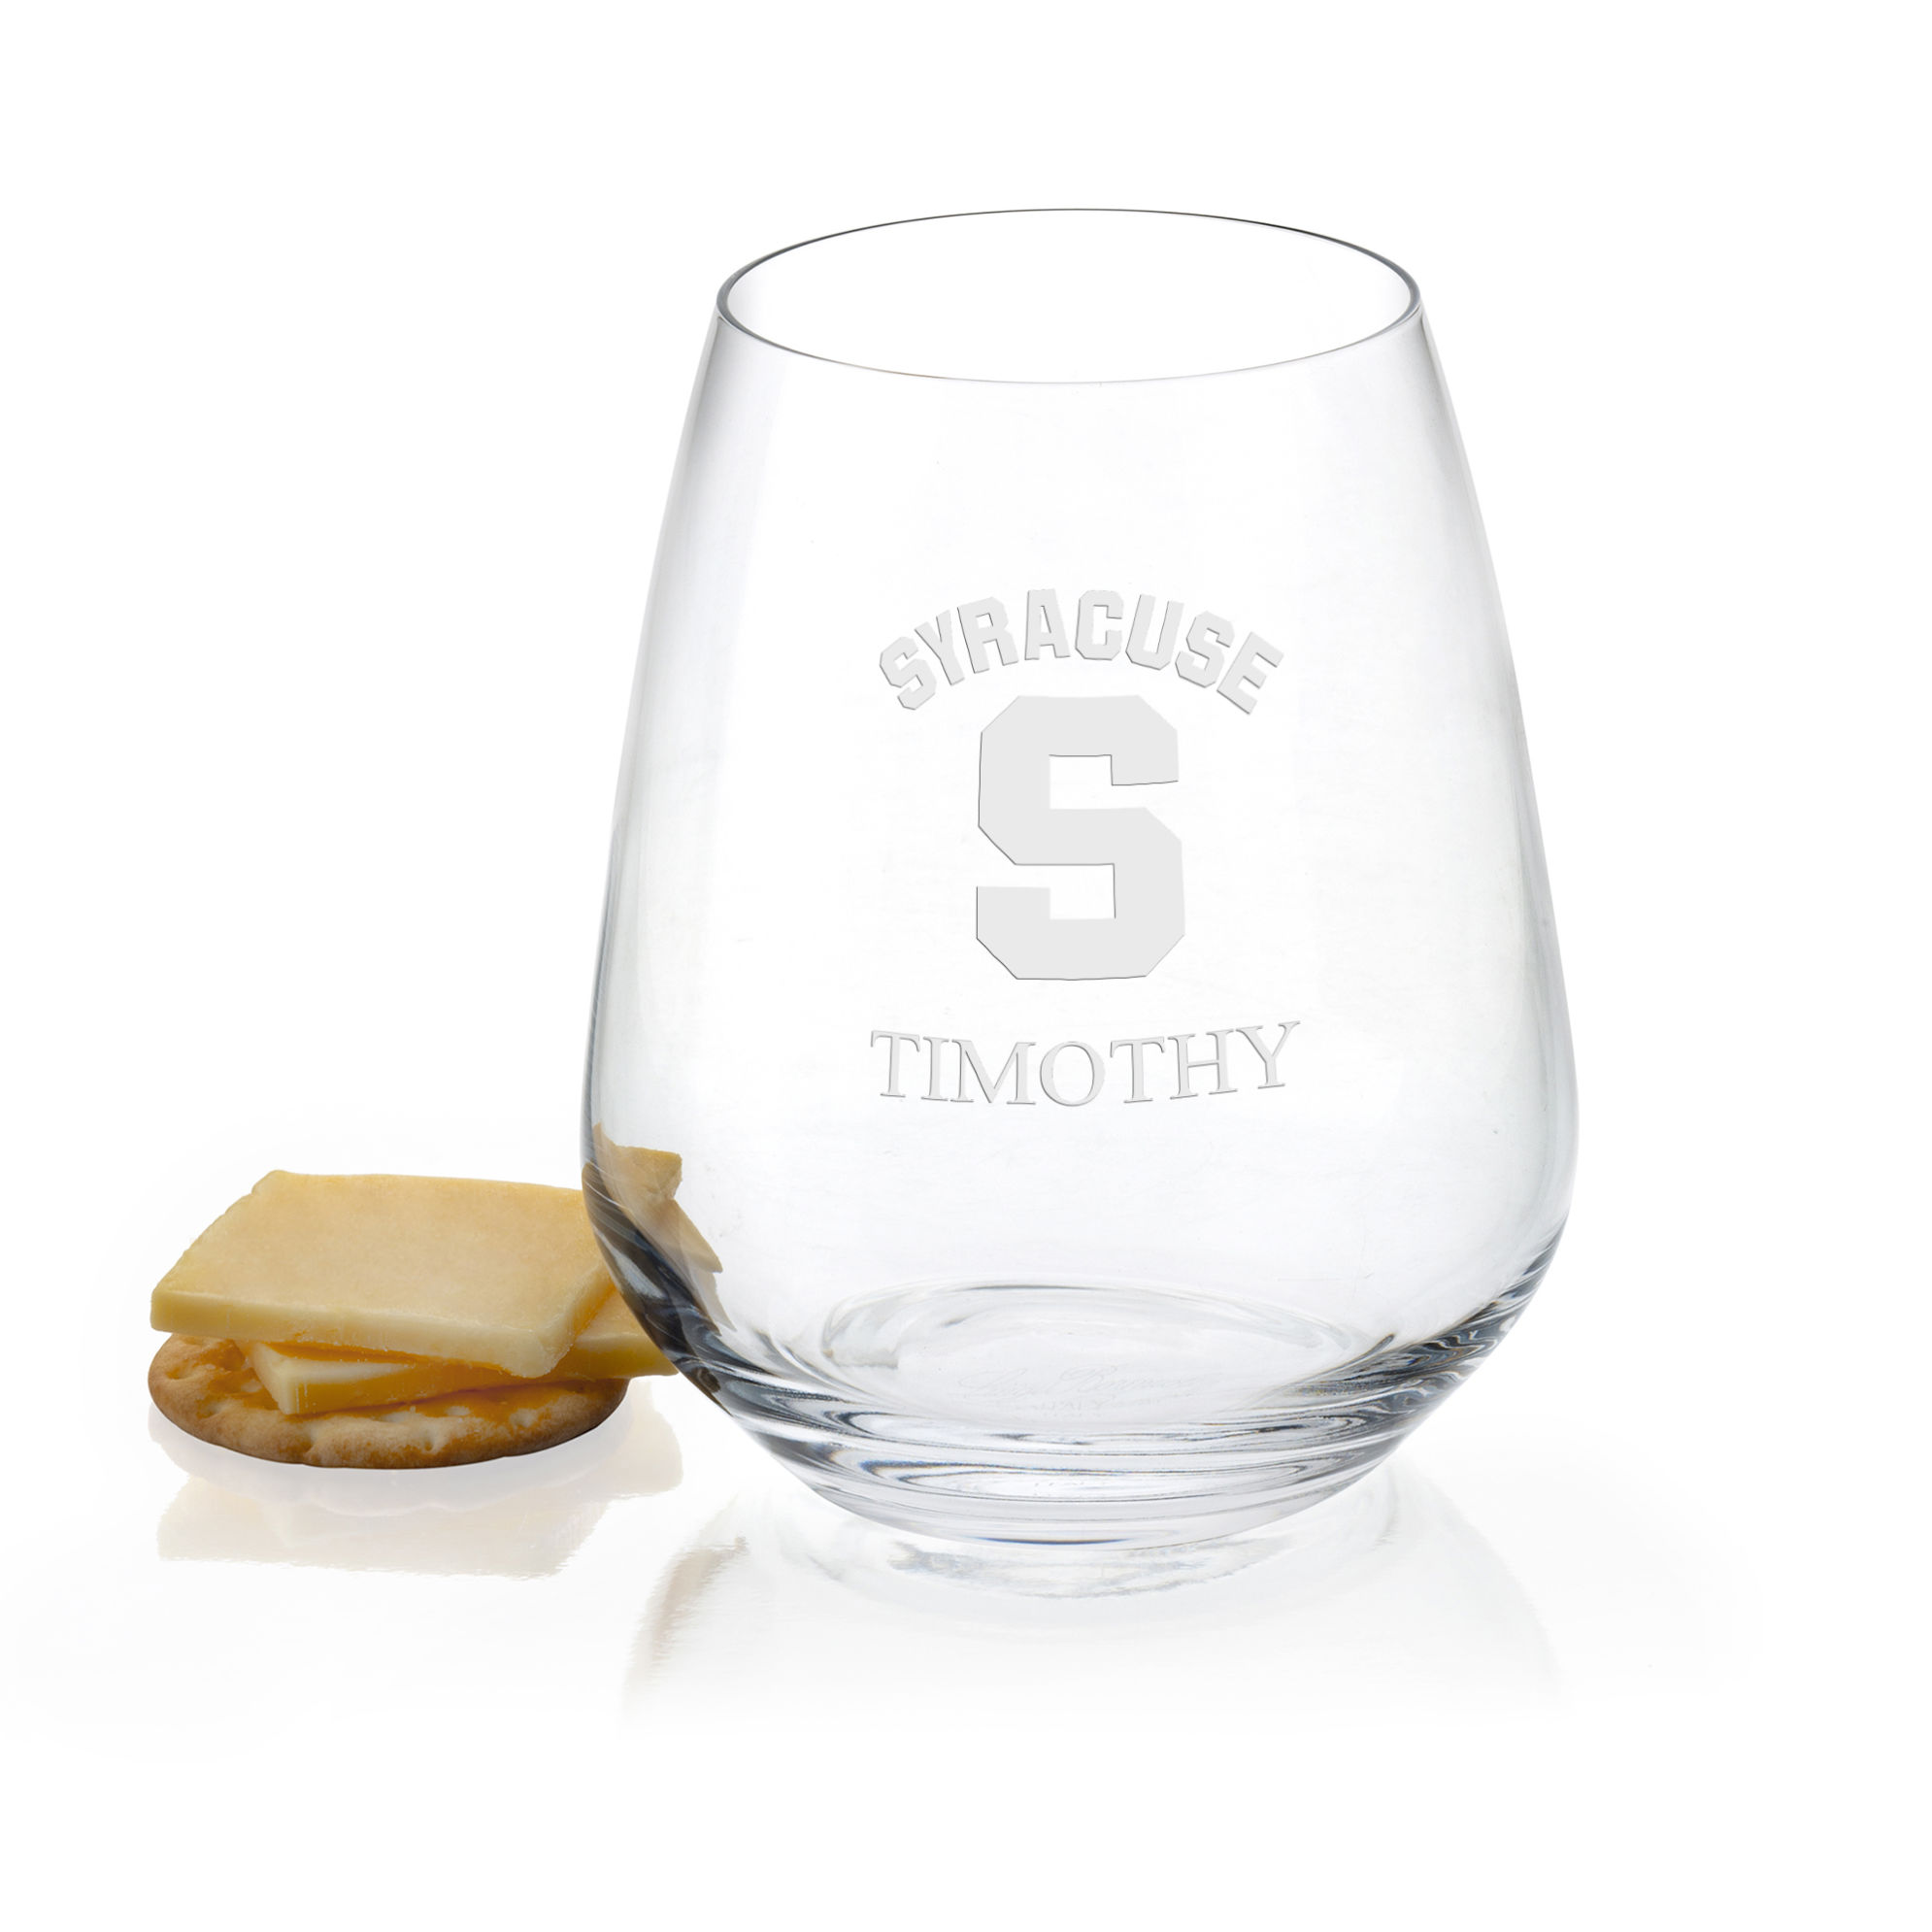 Syracuse University Stemless Wine Glasses - Set of 2